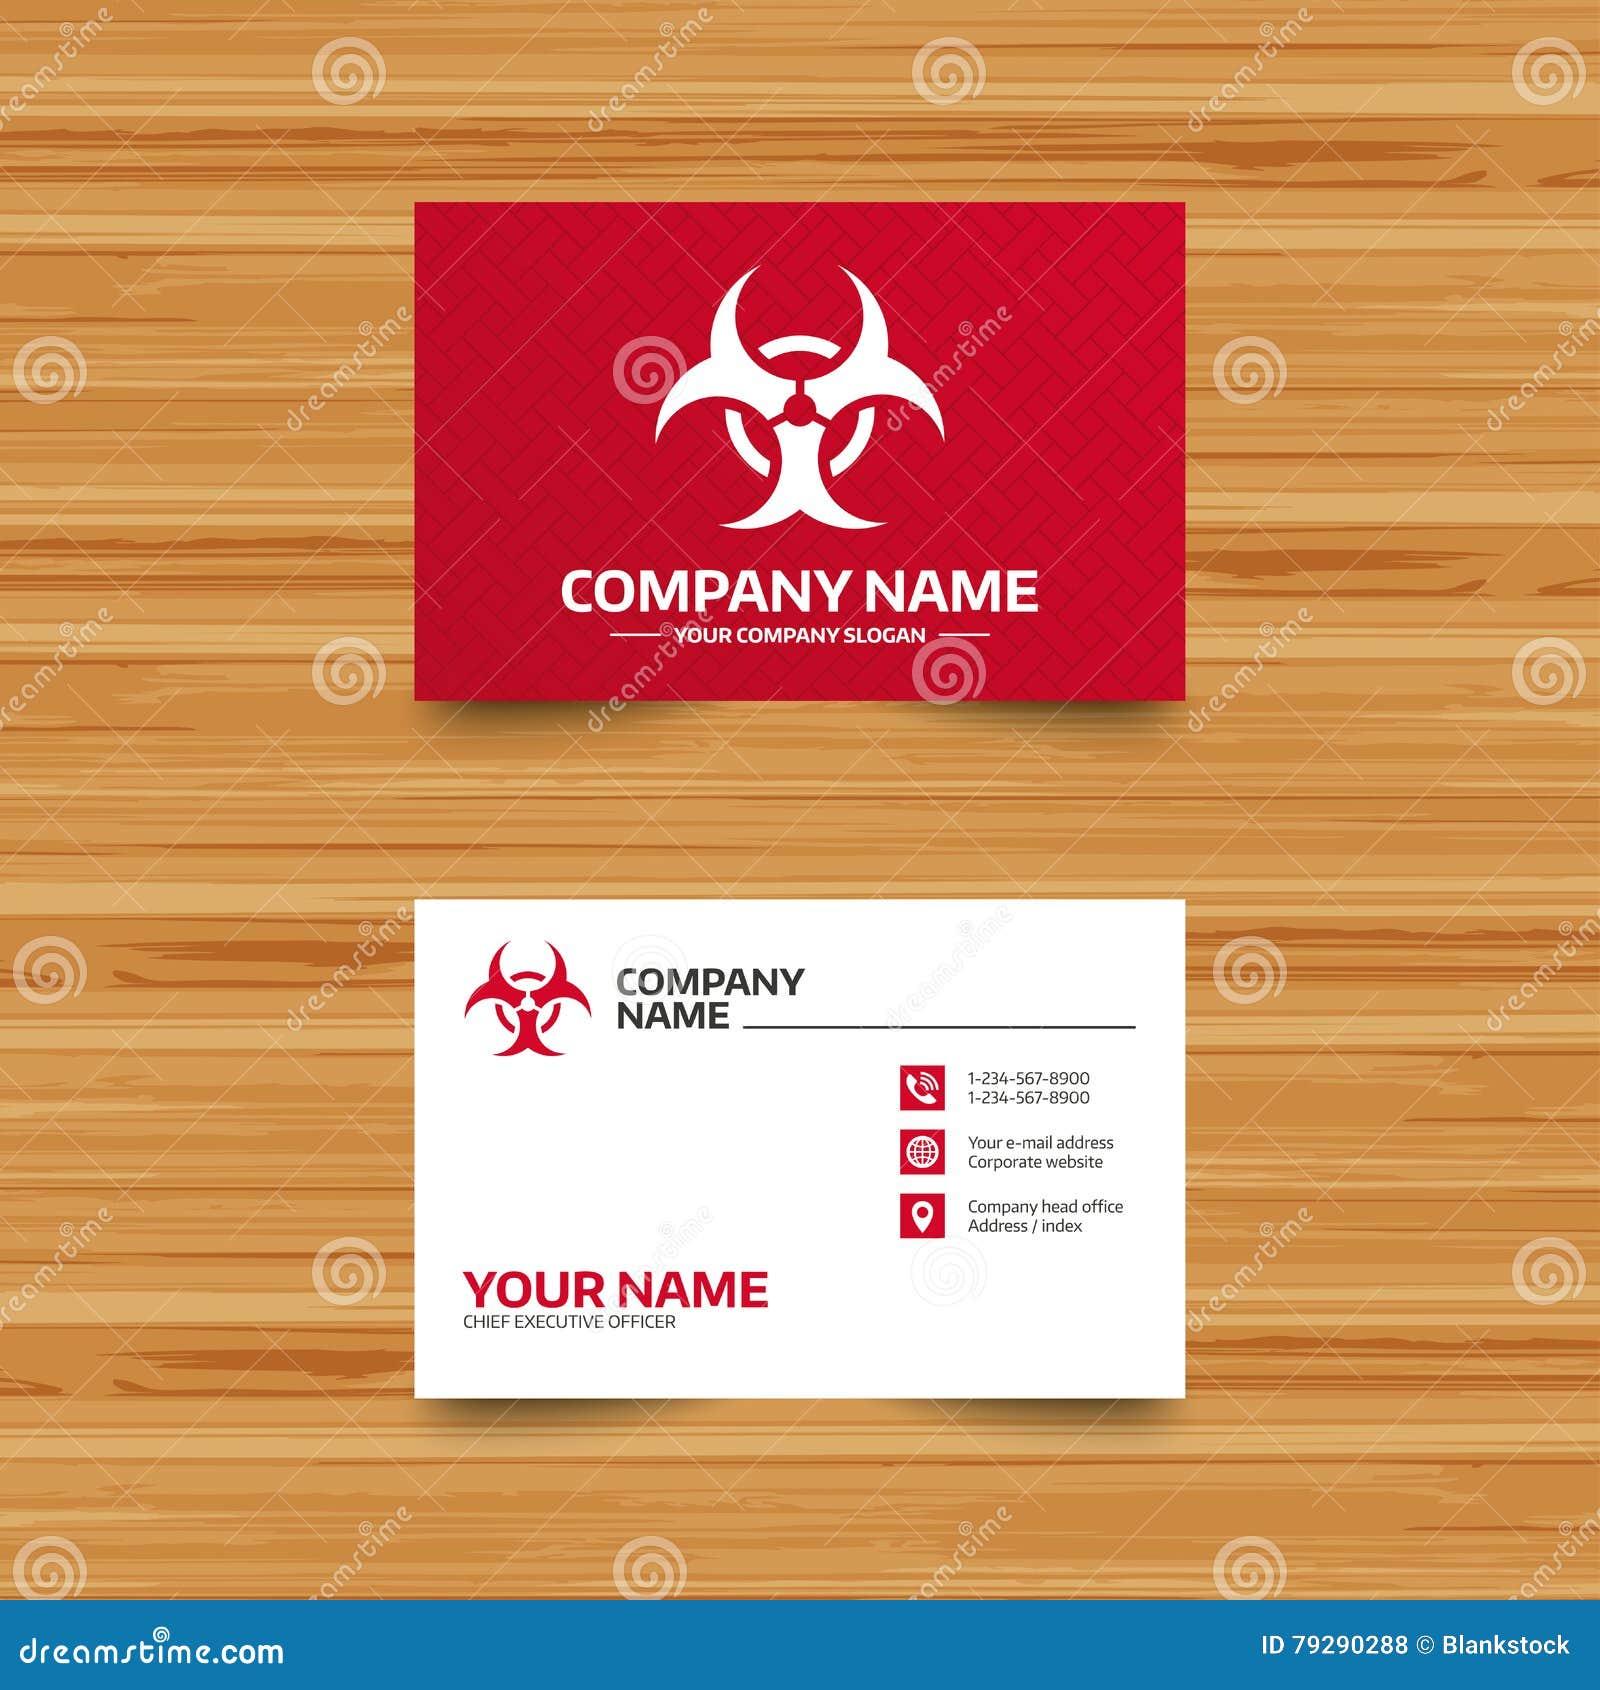 Biohazard Sign Icon  Danger Symbol  Stock Vector - Illustration of